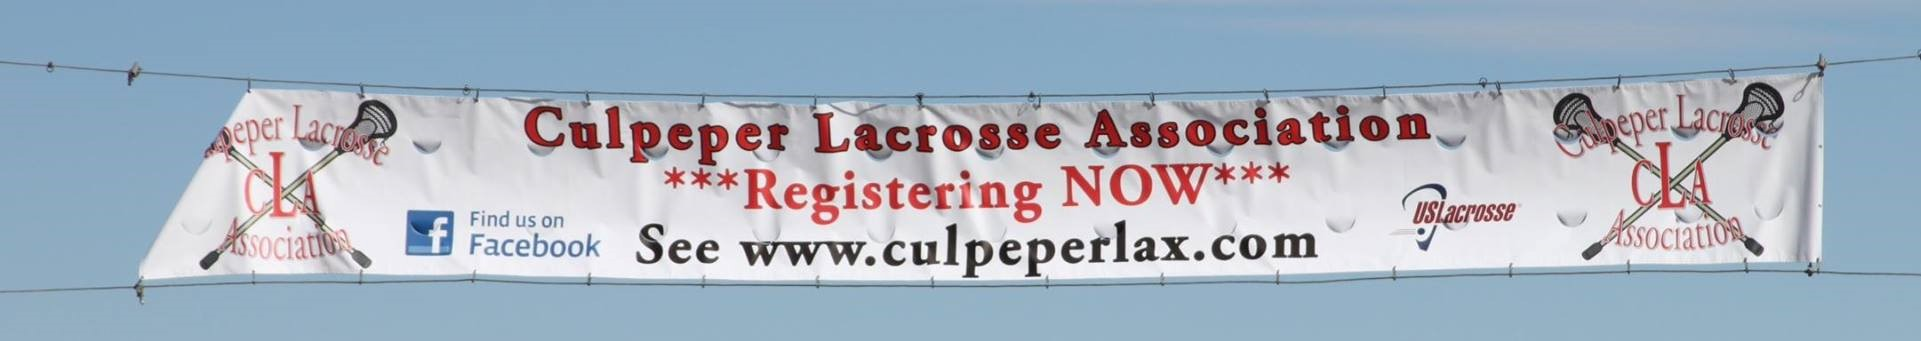 Culpeper Lacrosse Association, Lacrosse, Goal, Culpeper Sports Complex